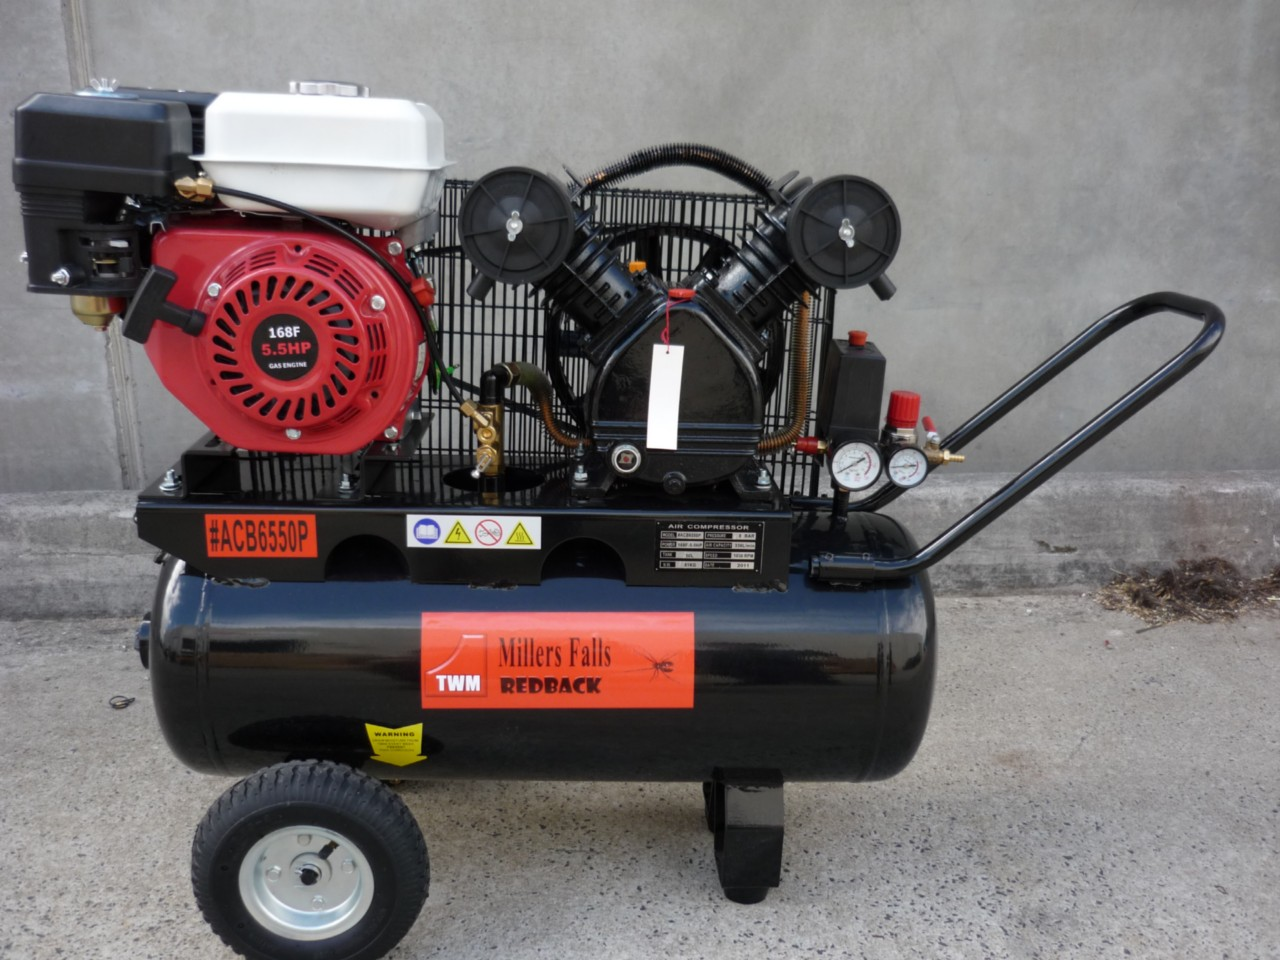 AIR-COMPRESSOR-5-5hp-Petrol-Engine-4-stroke-Brand-New-12-Months-Warranty